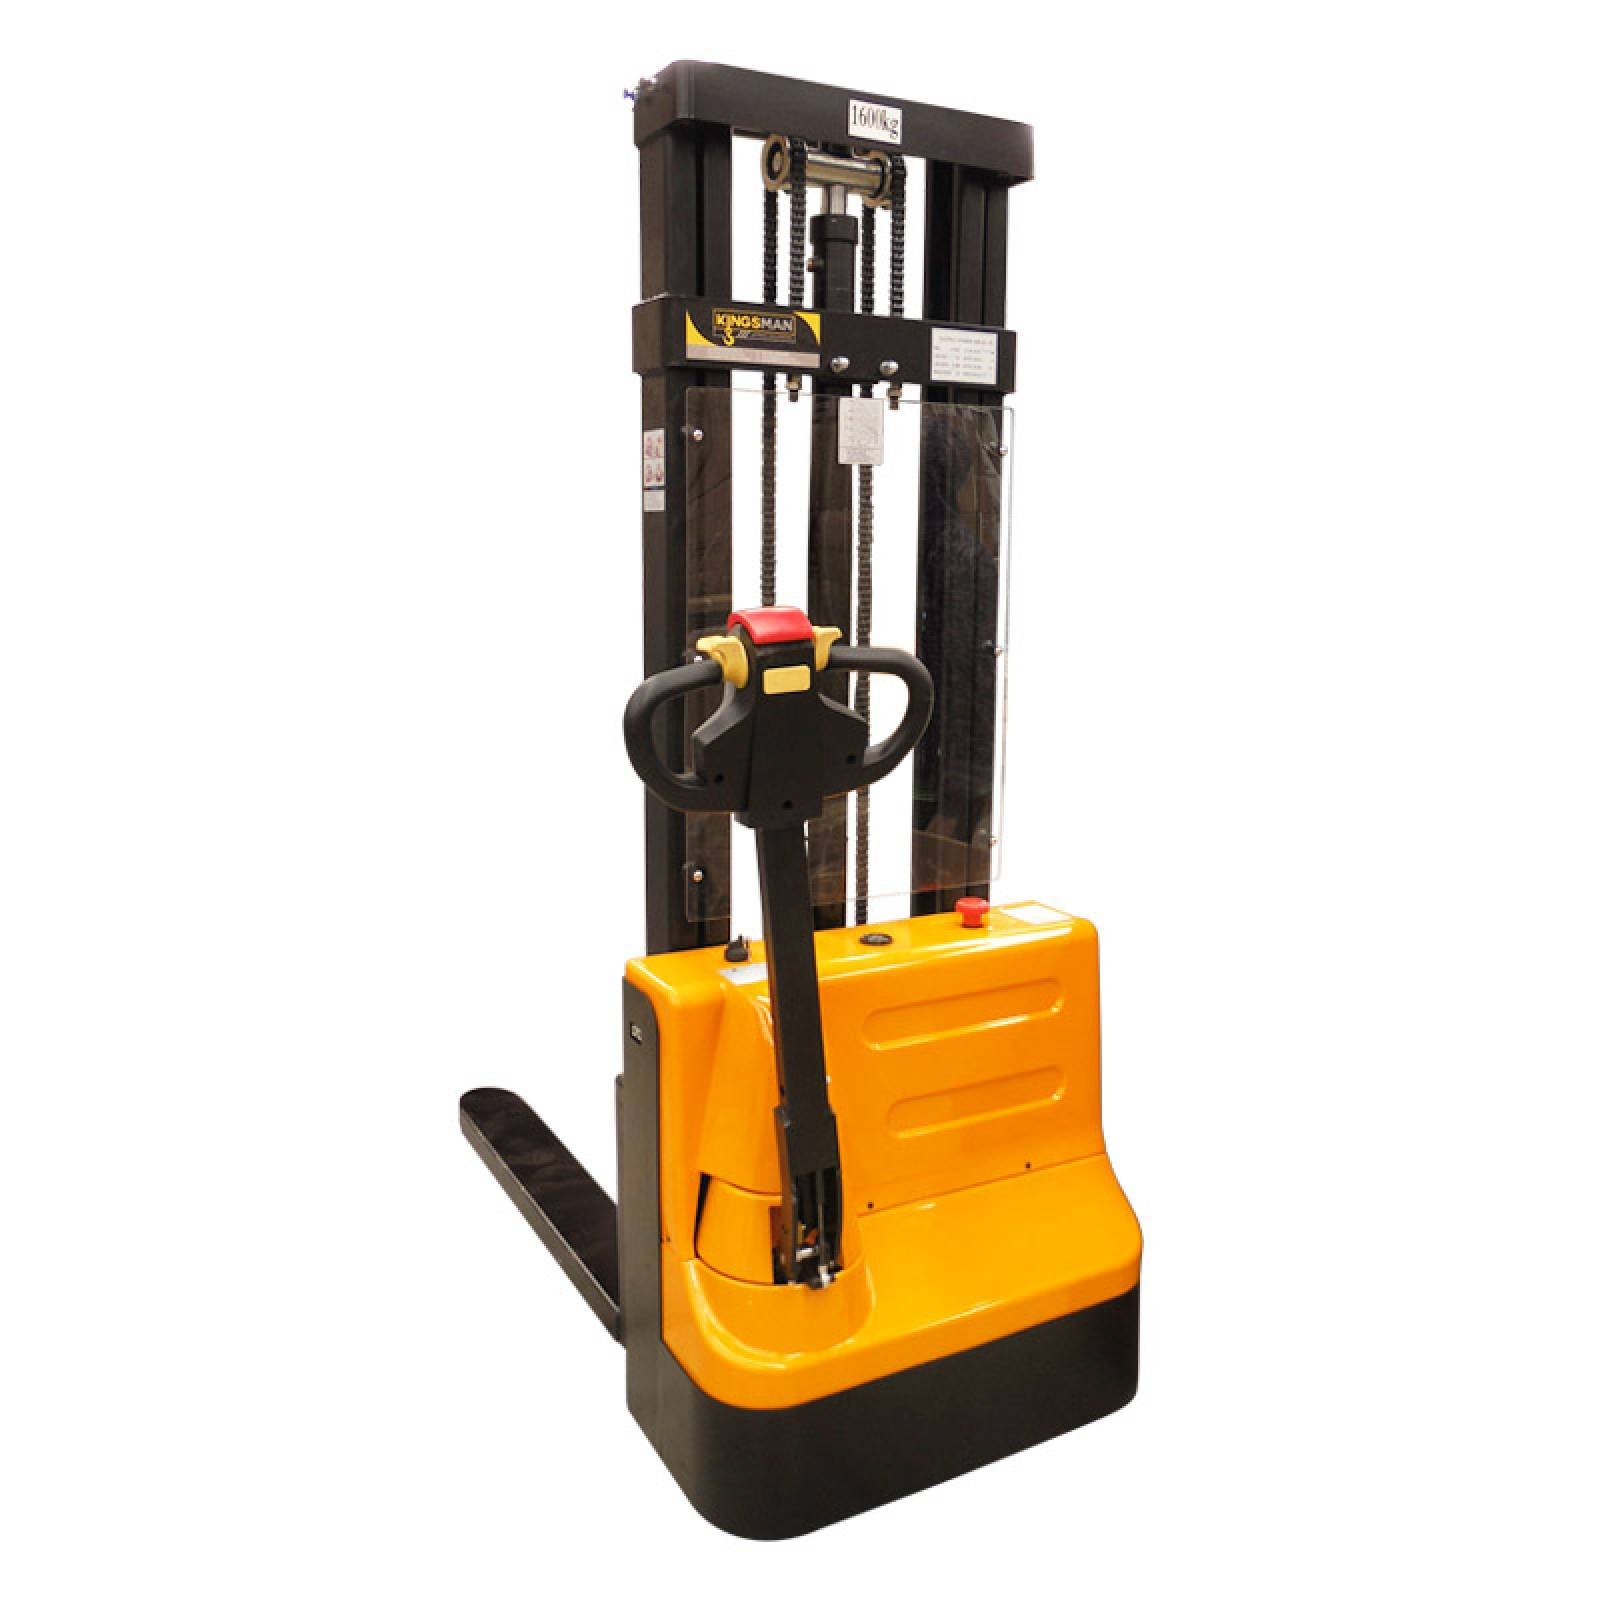 Patin Montacargas Apilador Electrico Cap 1 Ton 1.6m Kingsman